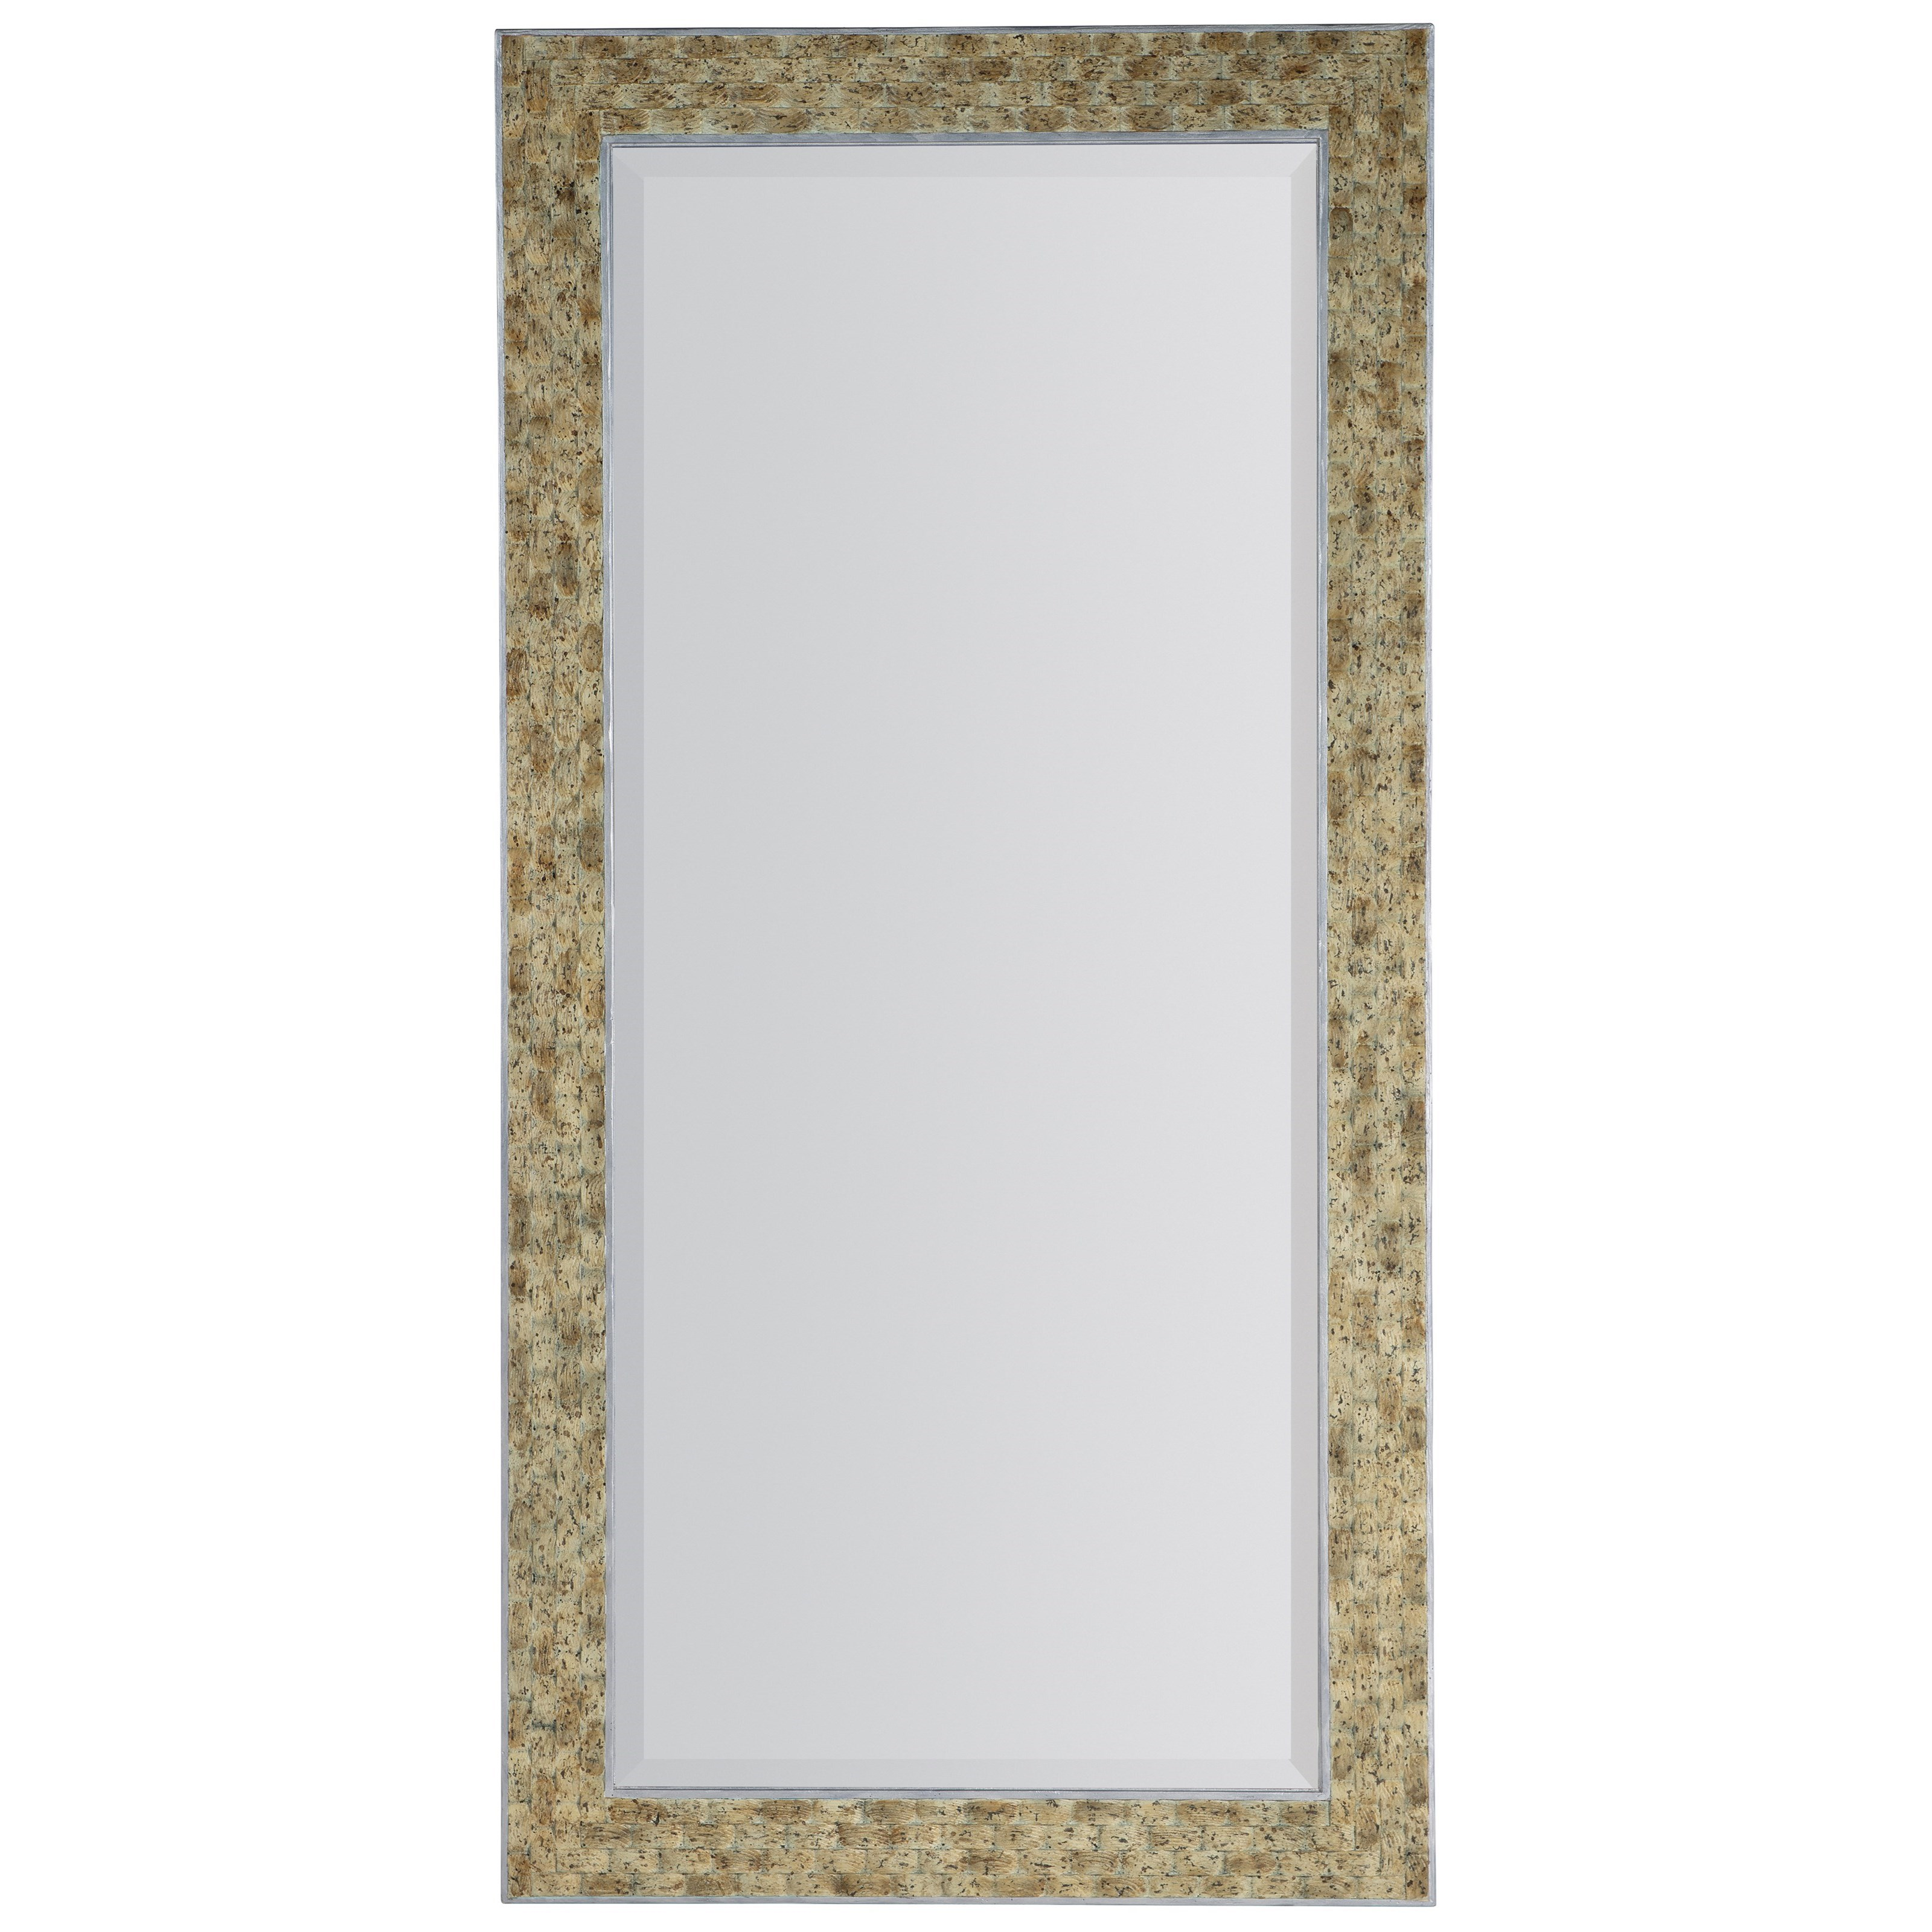 Surfrider Floor Mirror by Hooker Furniture at Miller Waldrop Furniture and Decor